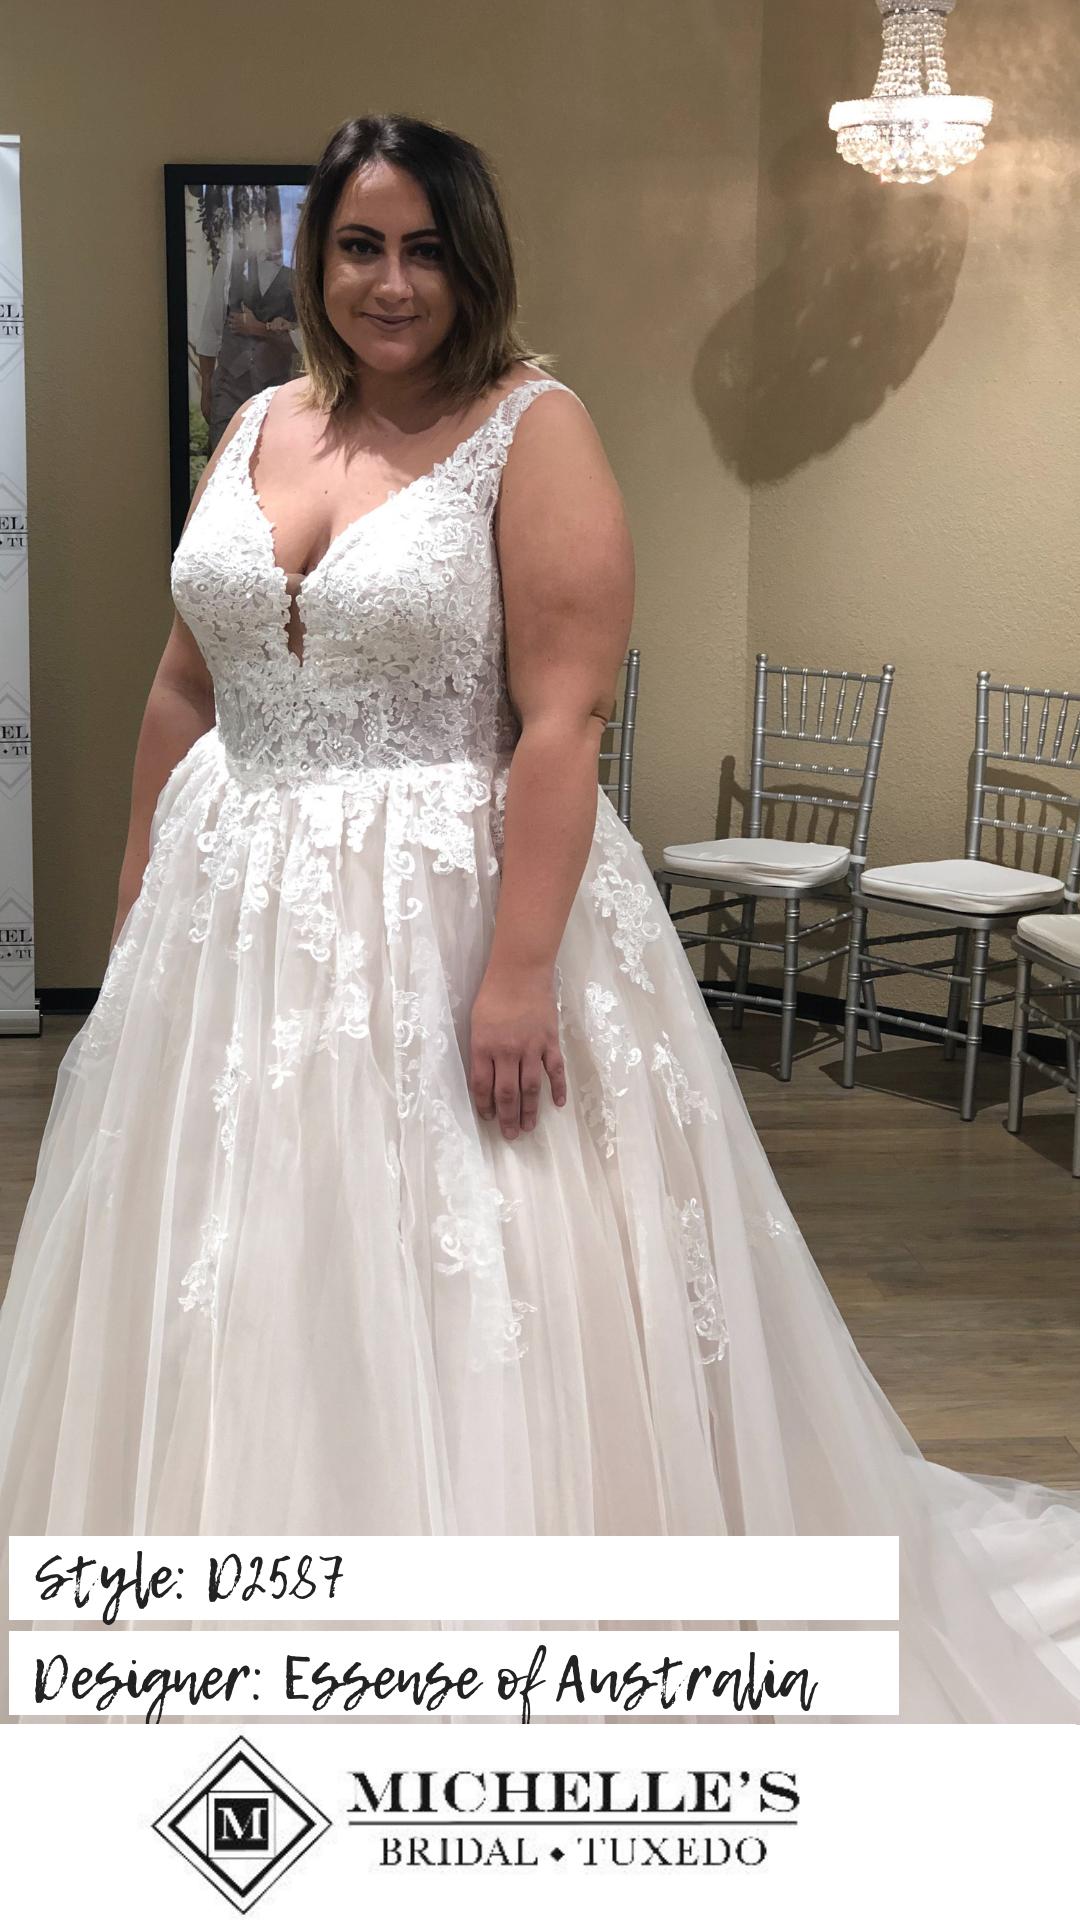 Plus Size Michelle S Bridal And Tuxedo Best Wedding Dresses Wedding Dresses Bridal [ 1920 x 1080 Pixel ]